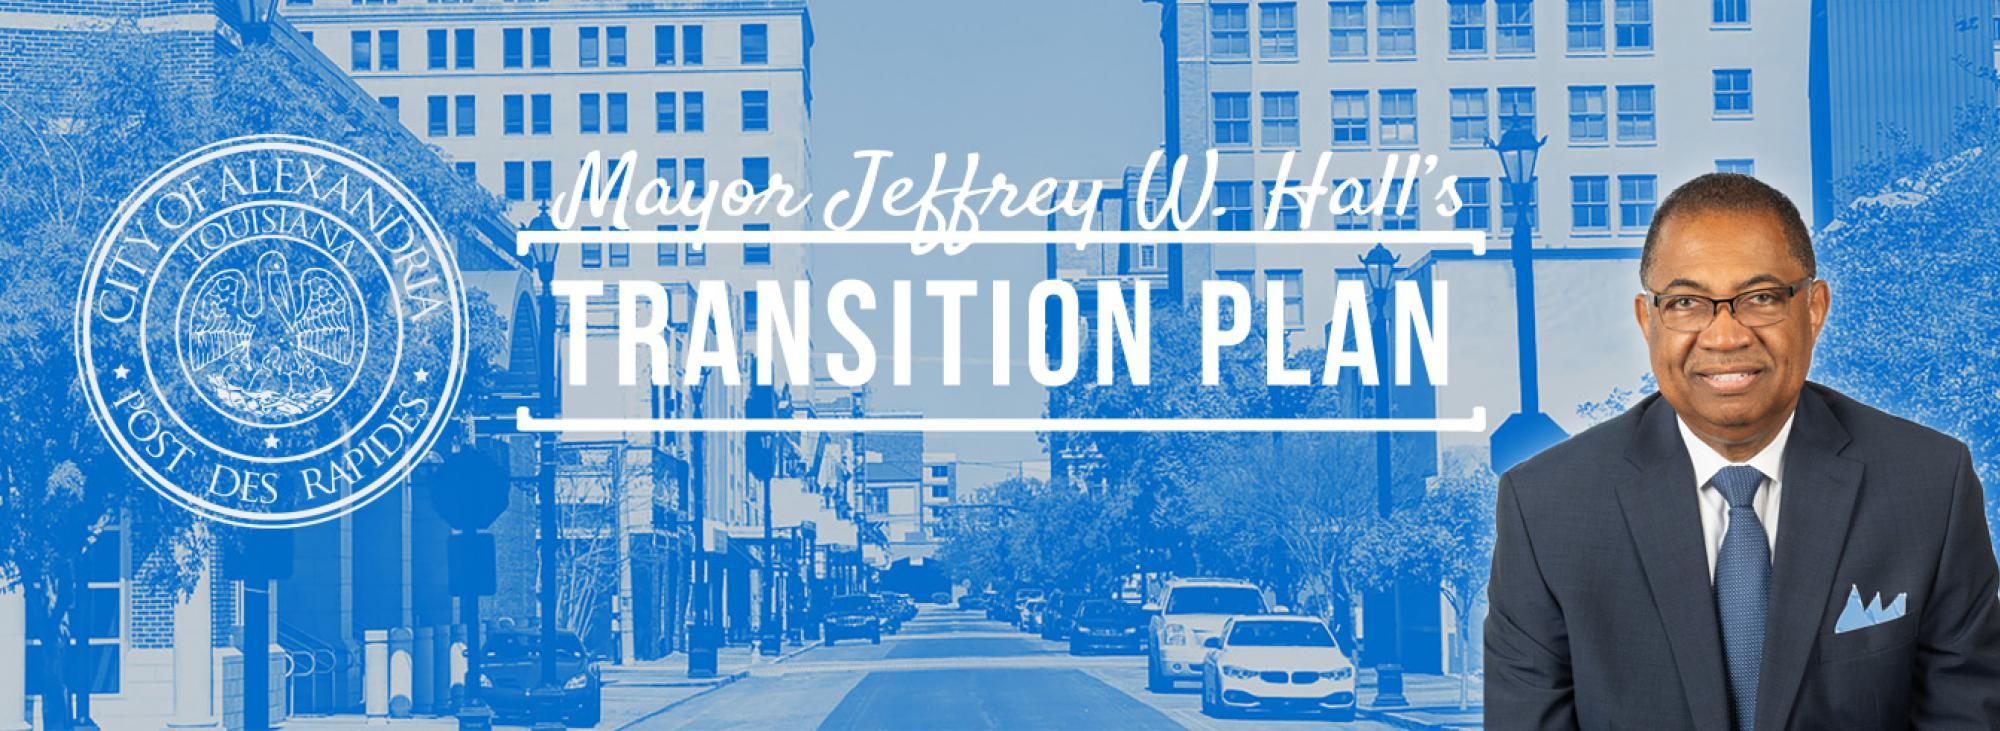 Mayor Jeffrey W. Hall's Transition Plan